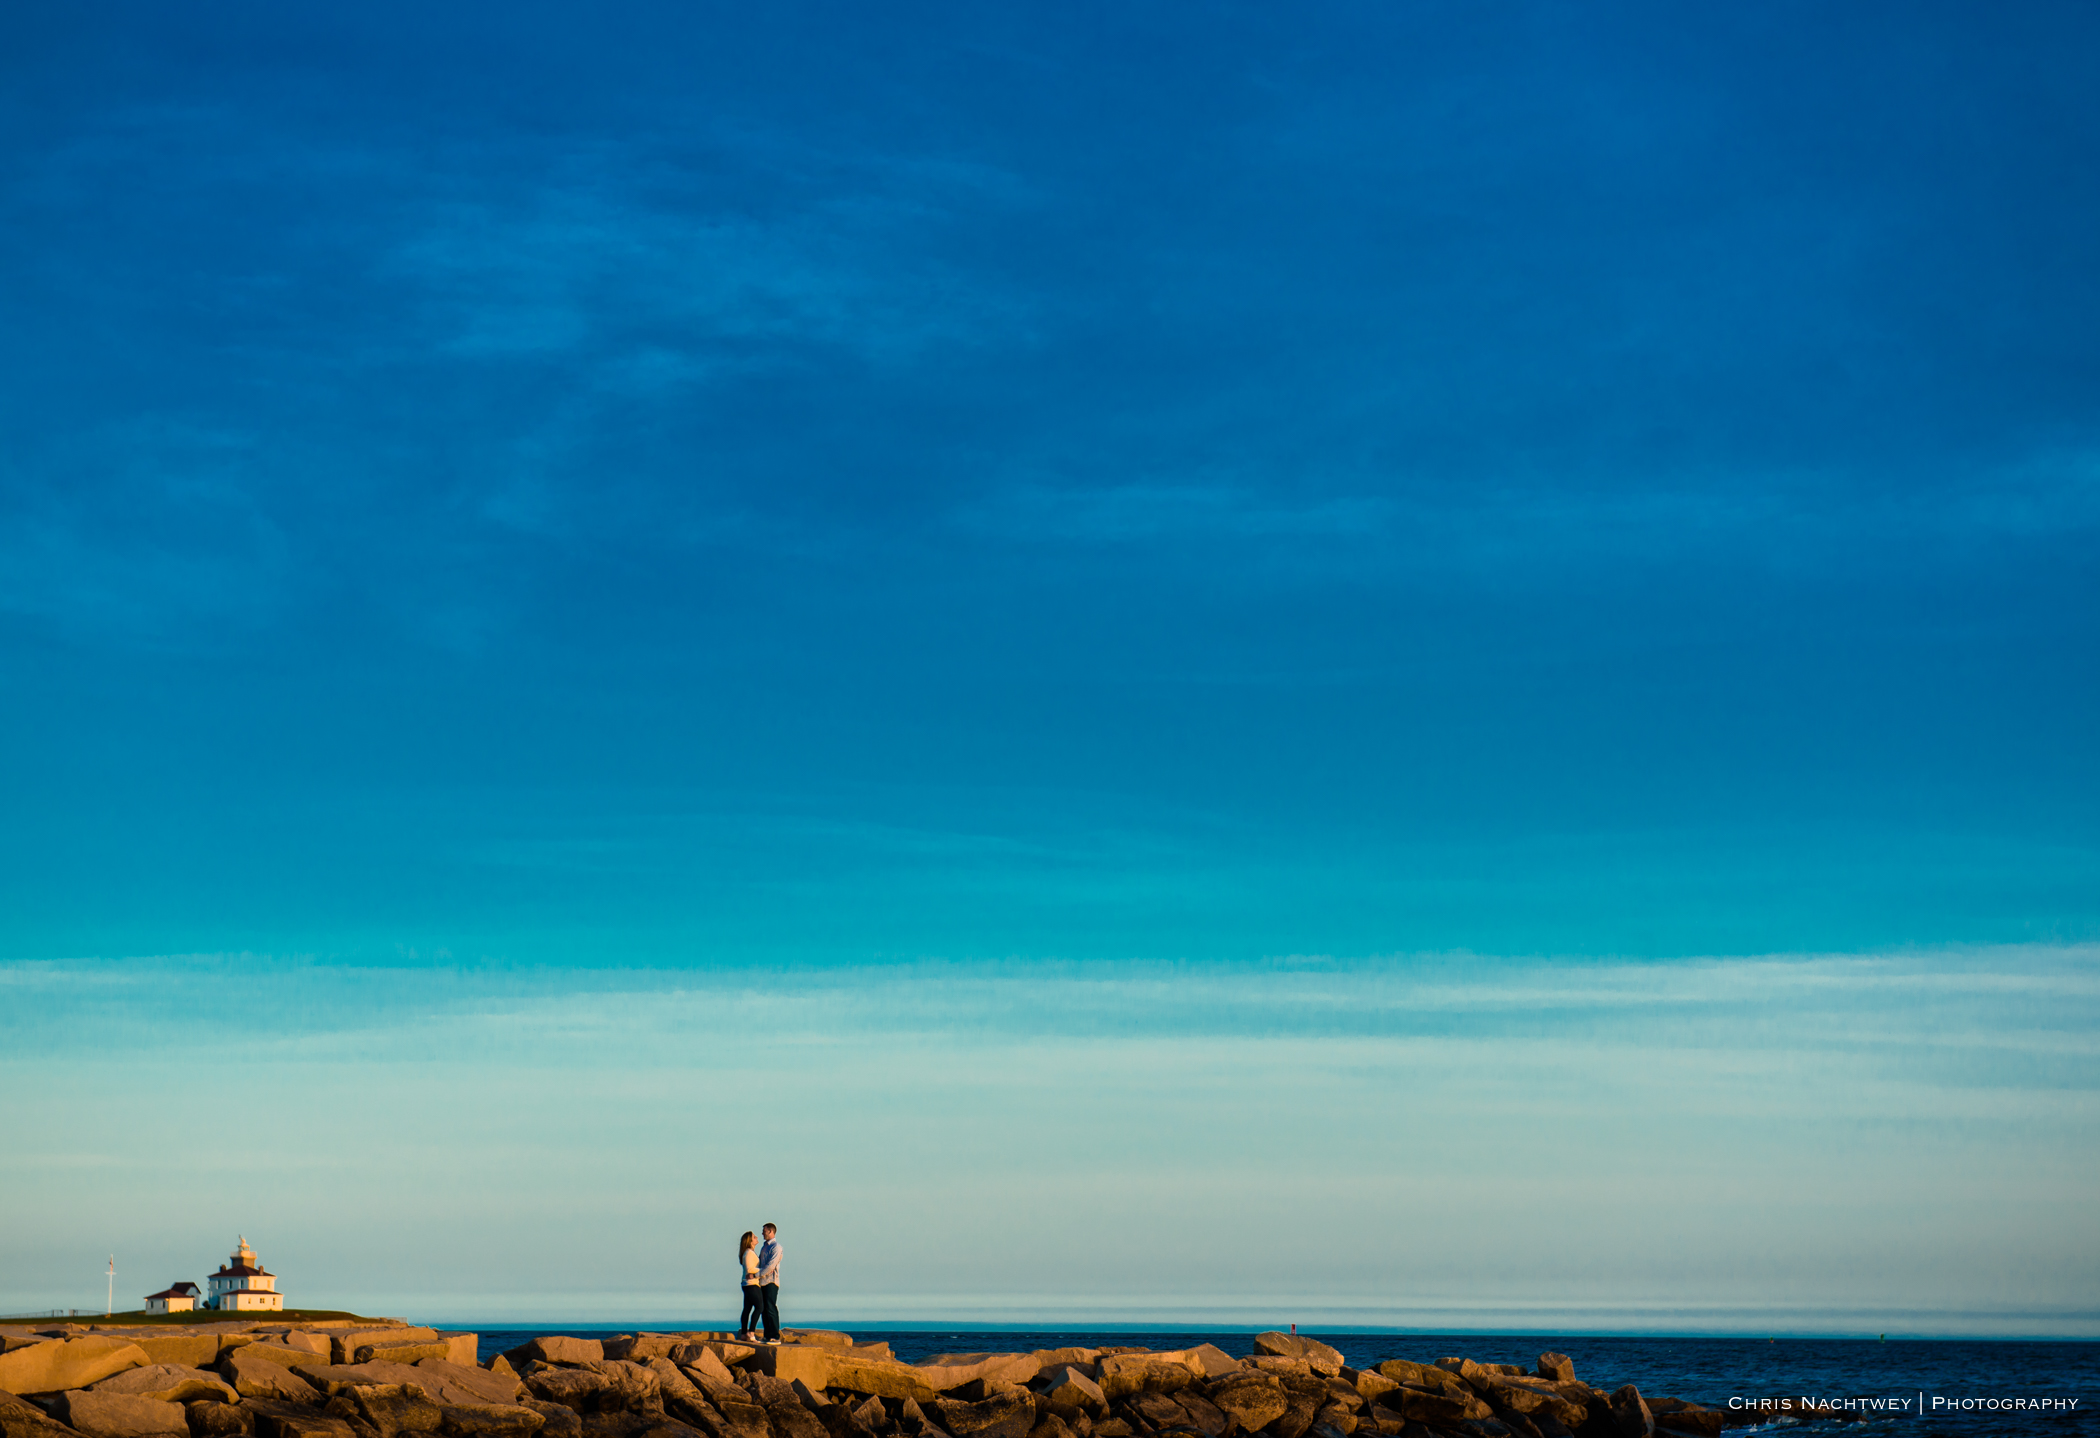 engagement-photos-westerly-watch-hill-rhode-island-katie-andy-chris-nachtwey-photography-2018-6.jpg